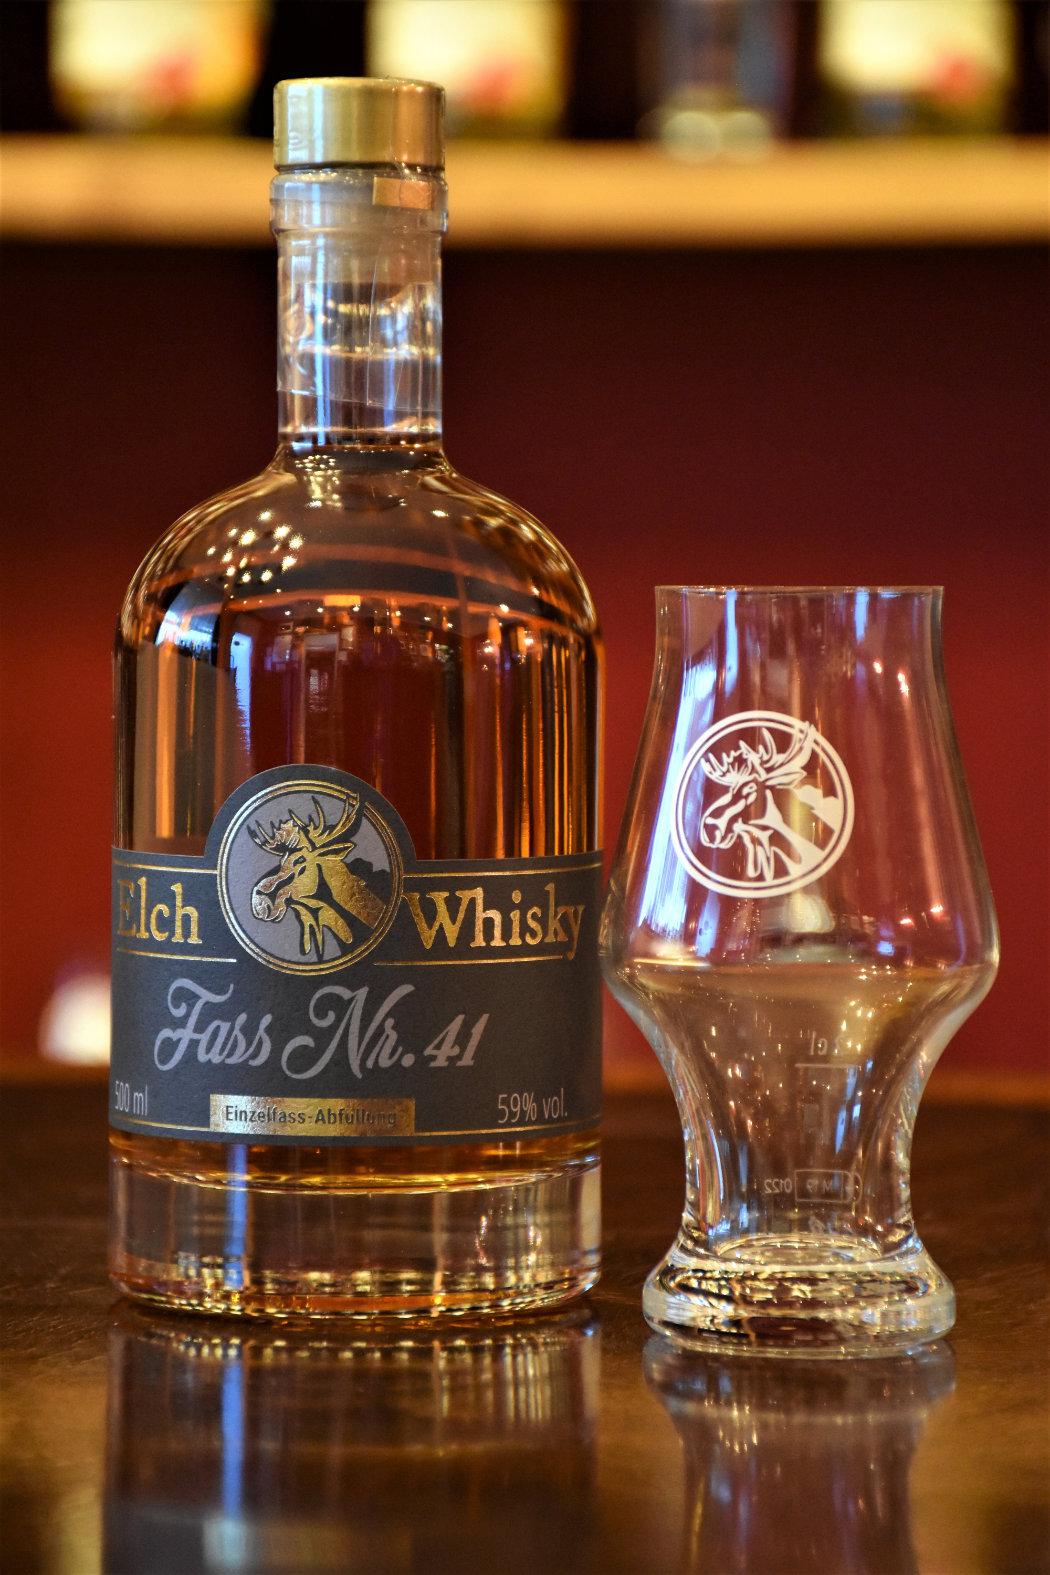 Elch Whisky, Fass Nr. 41, Madeira Finish, 59 %, 0,5l/Fl., mit Elch Whisky Glas